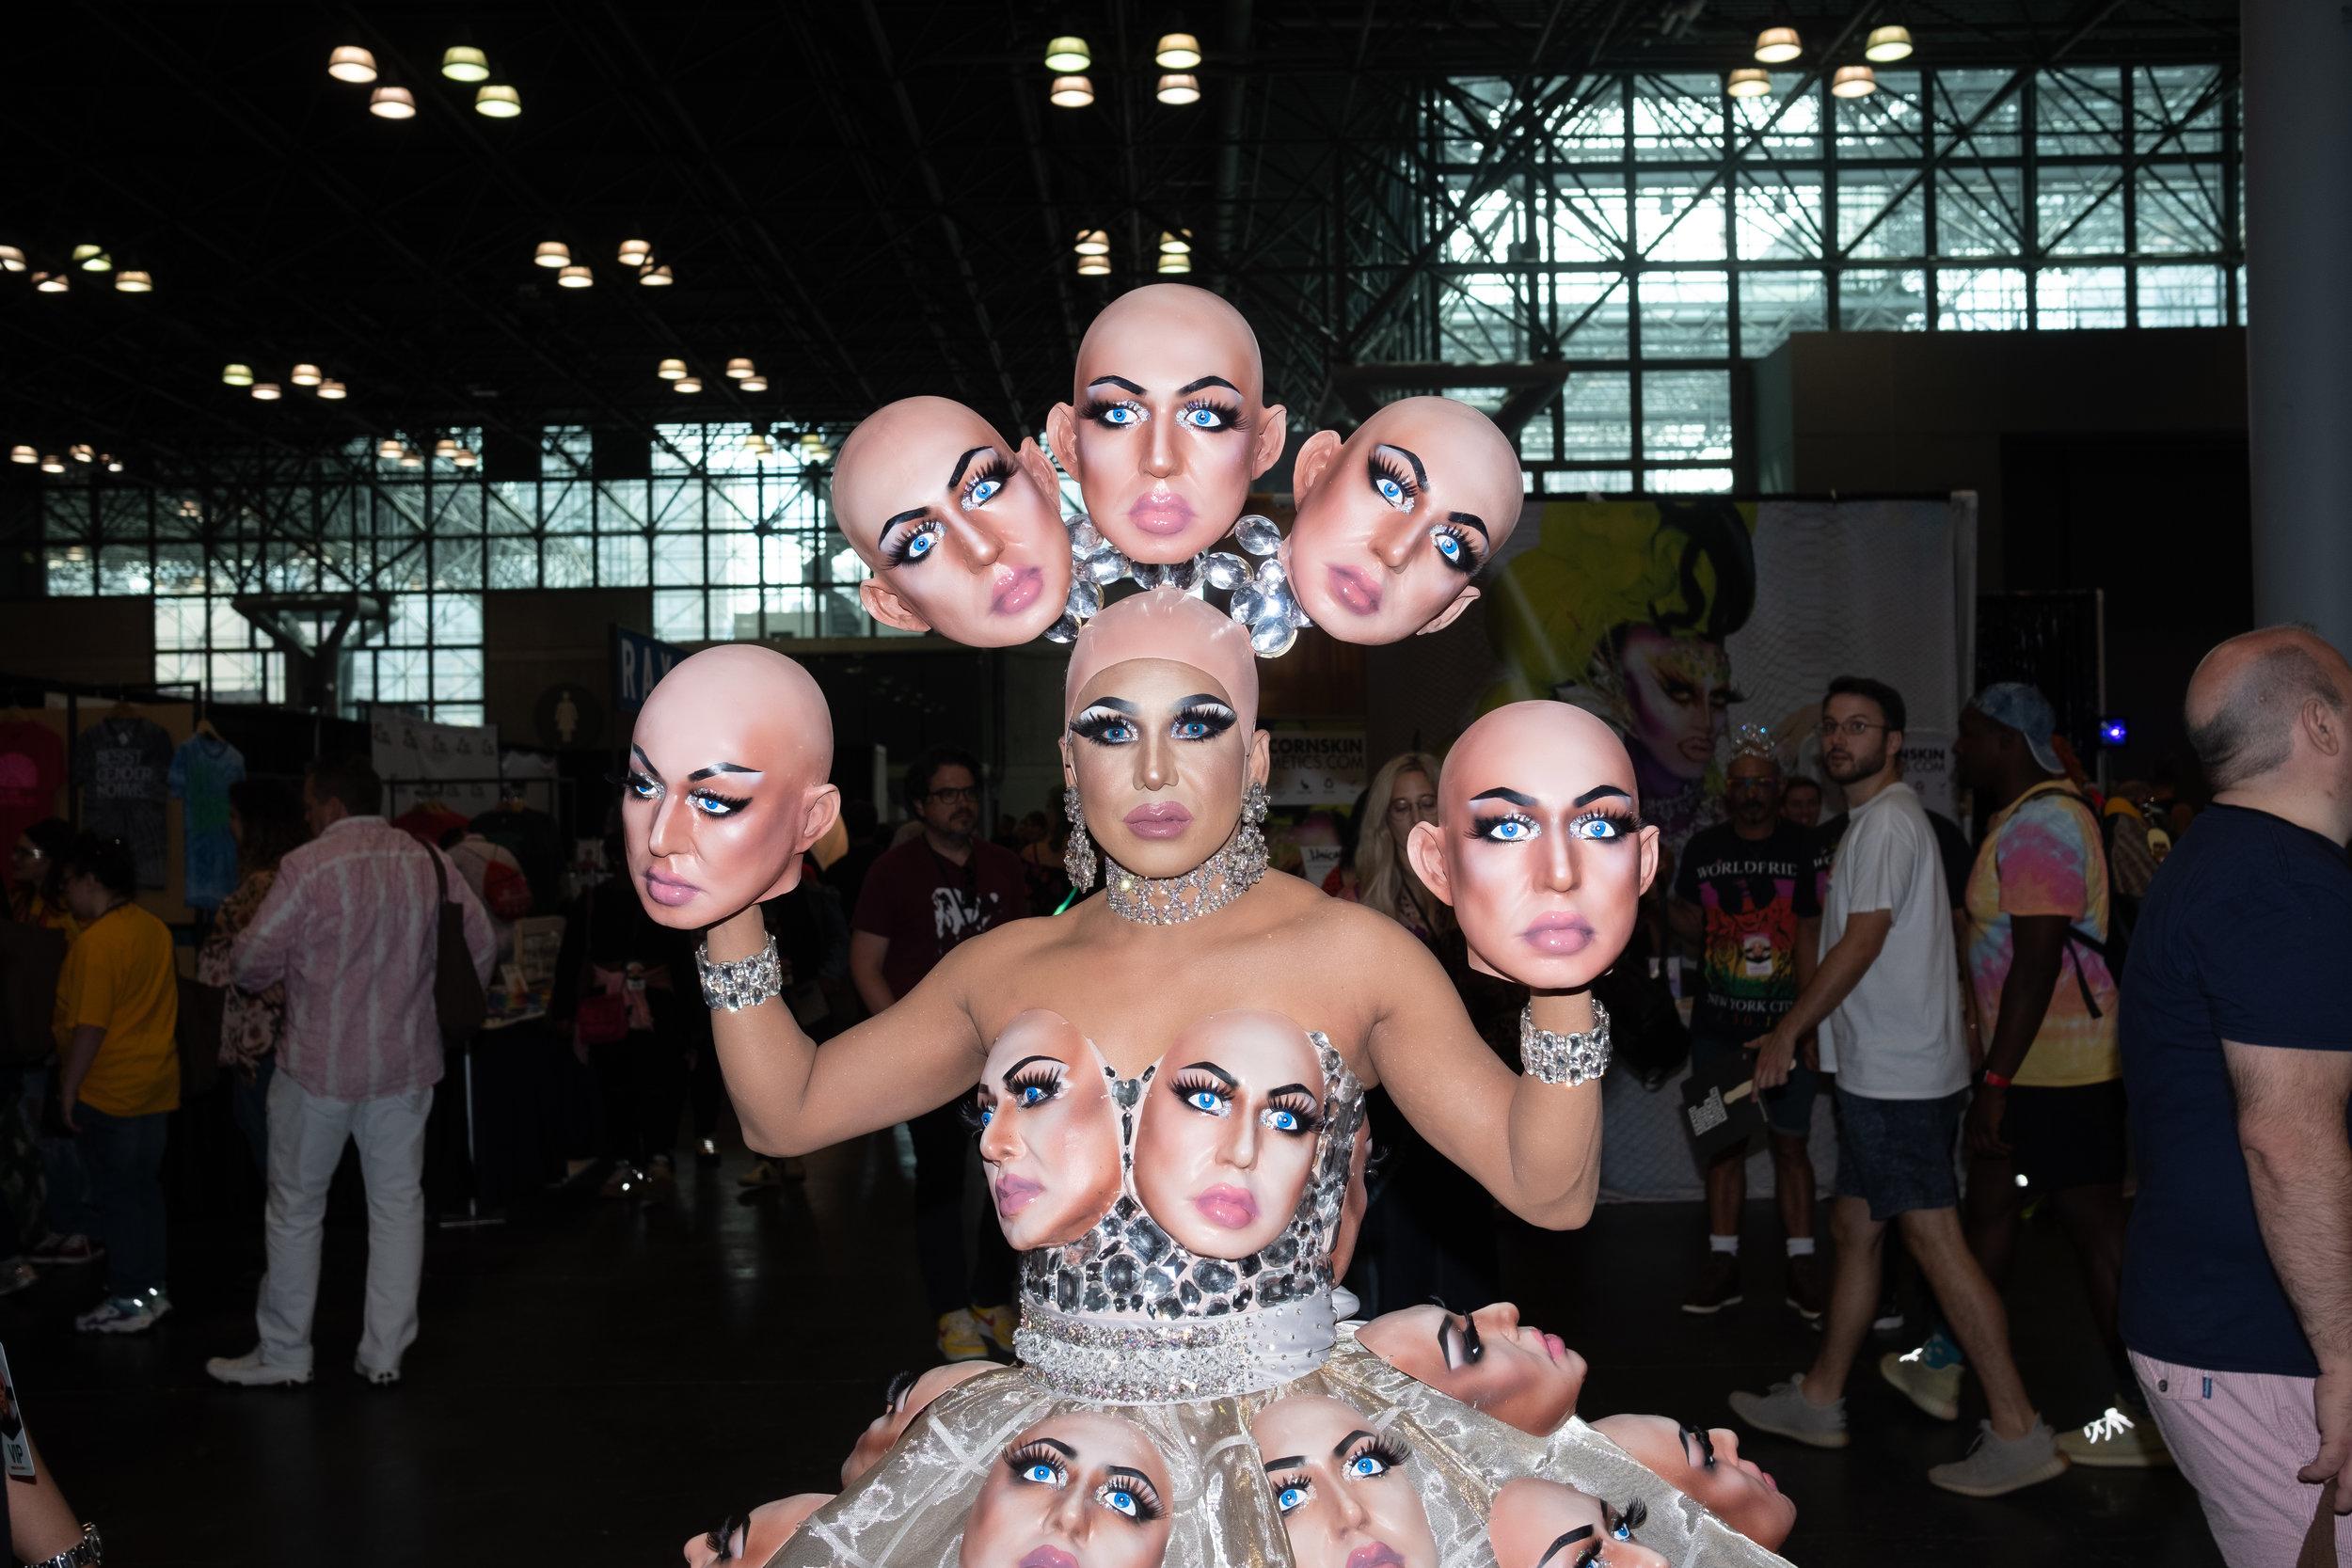 Drag_Vogue_Krule_DSCF7519.jpg